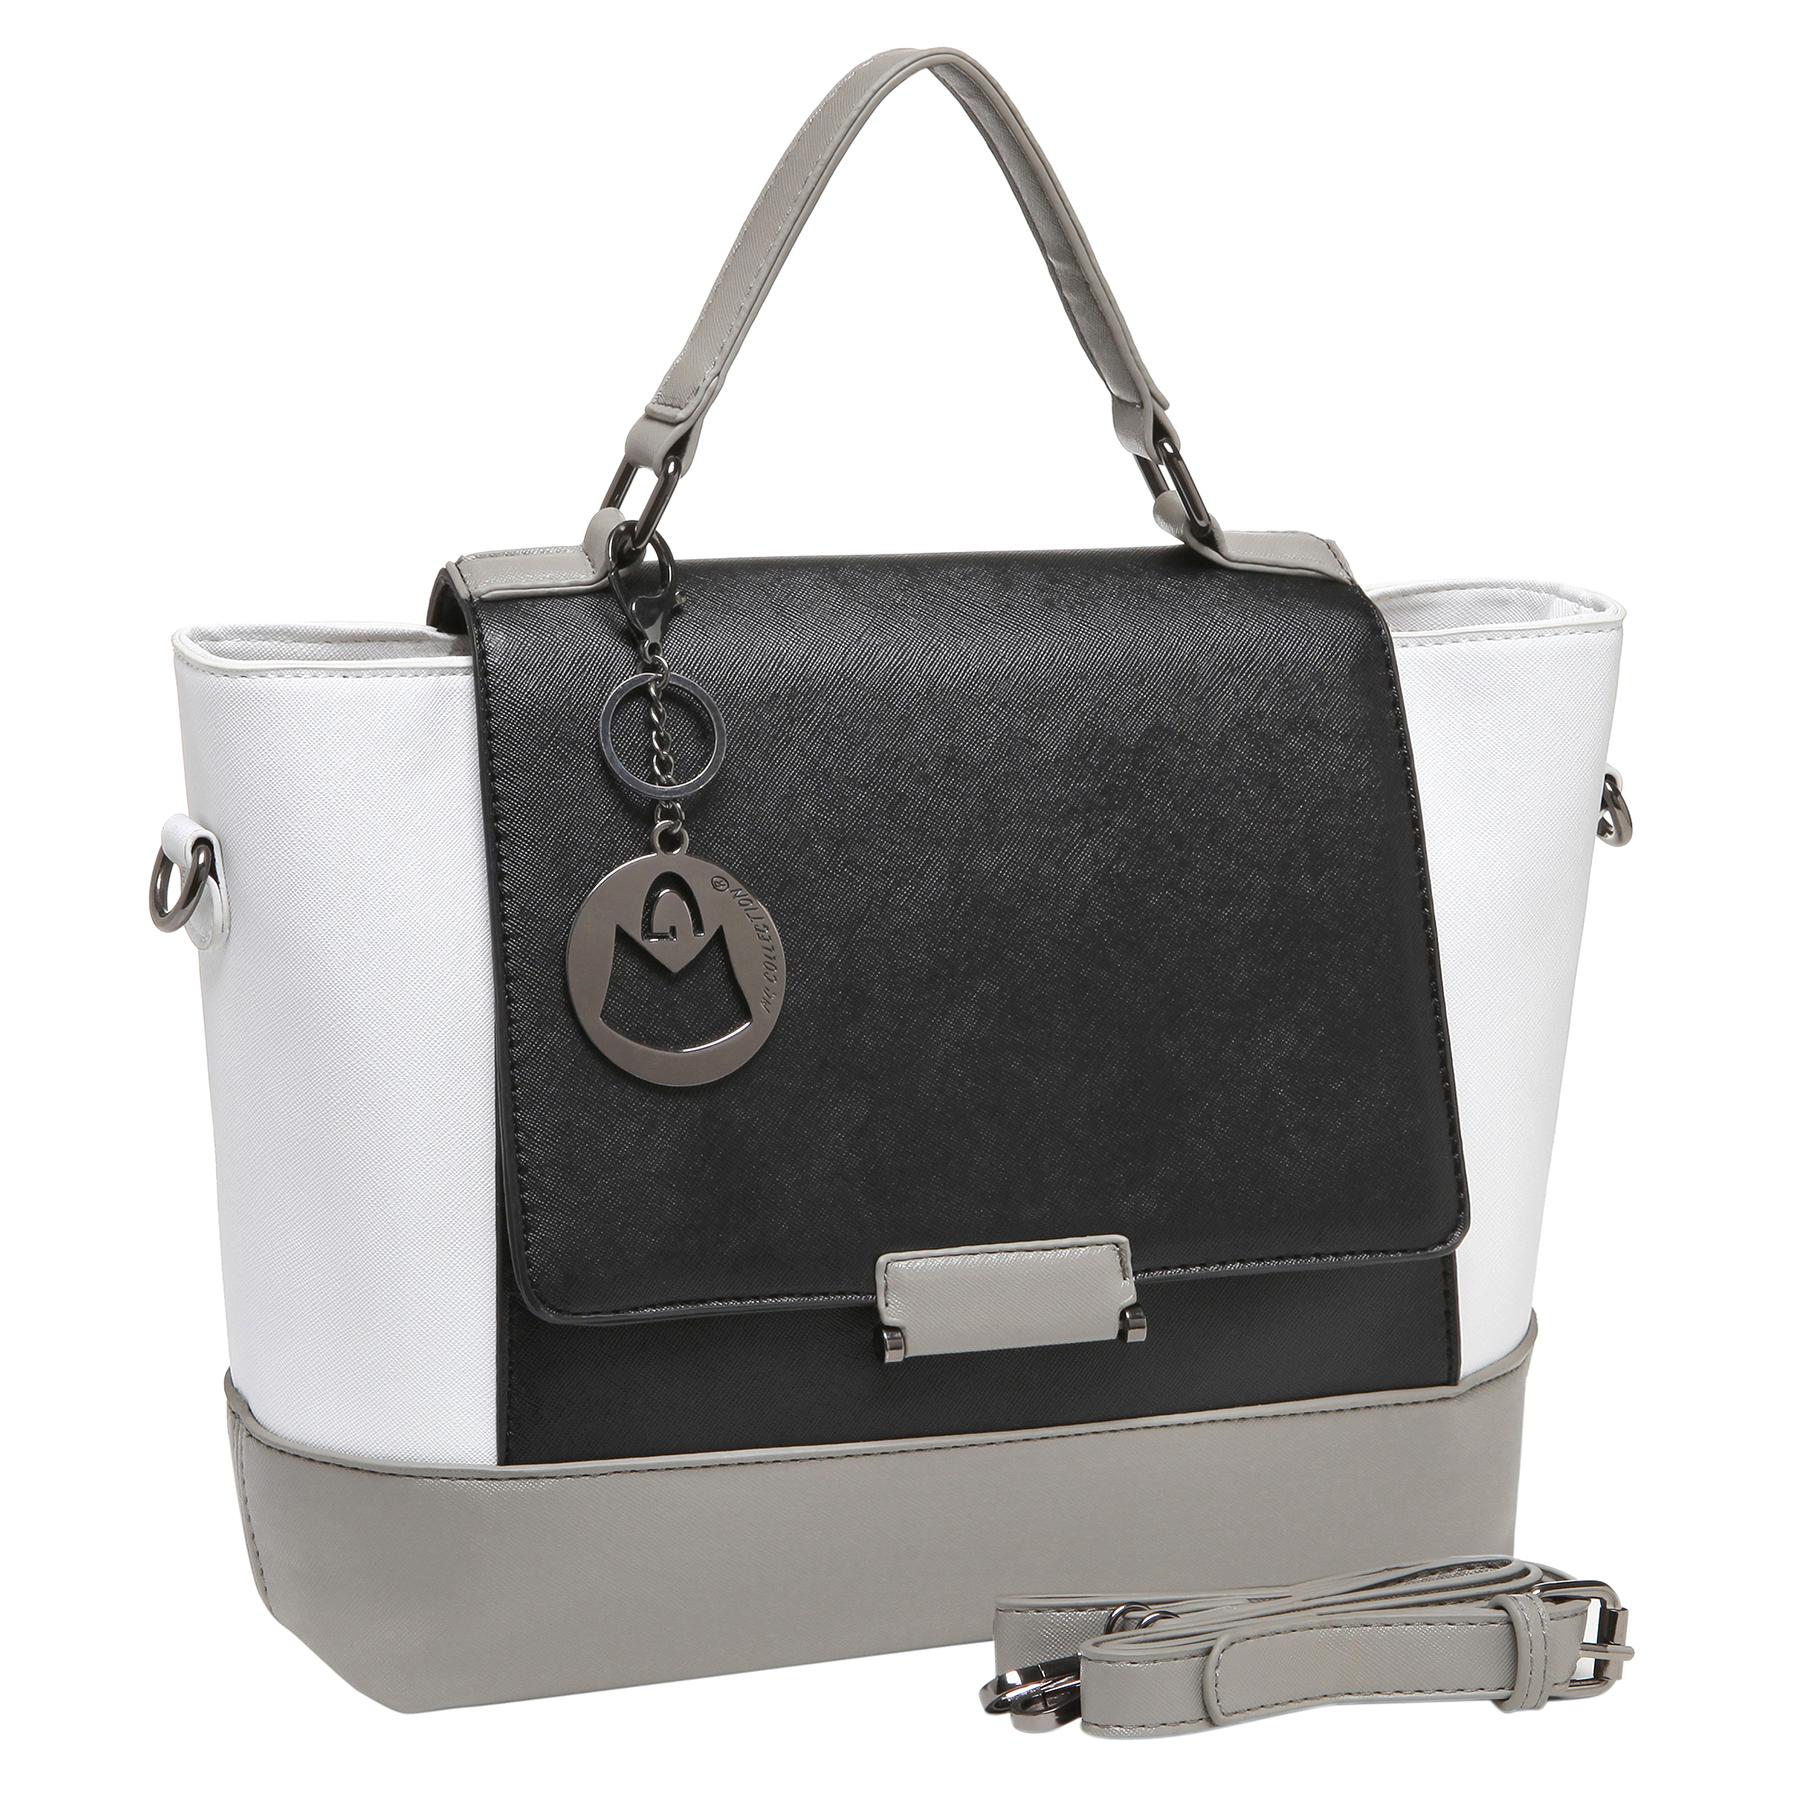 mg-collection-meryl-top-handle-tote-handbag-tb-h0651blk-1.jpg